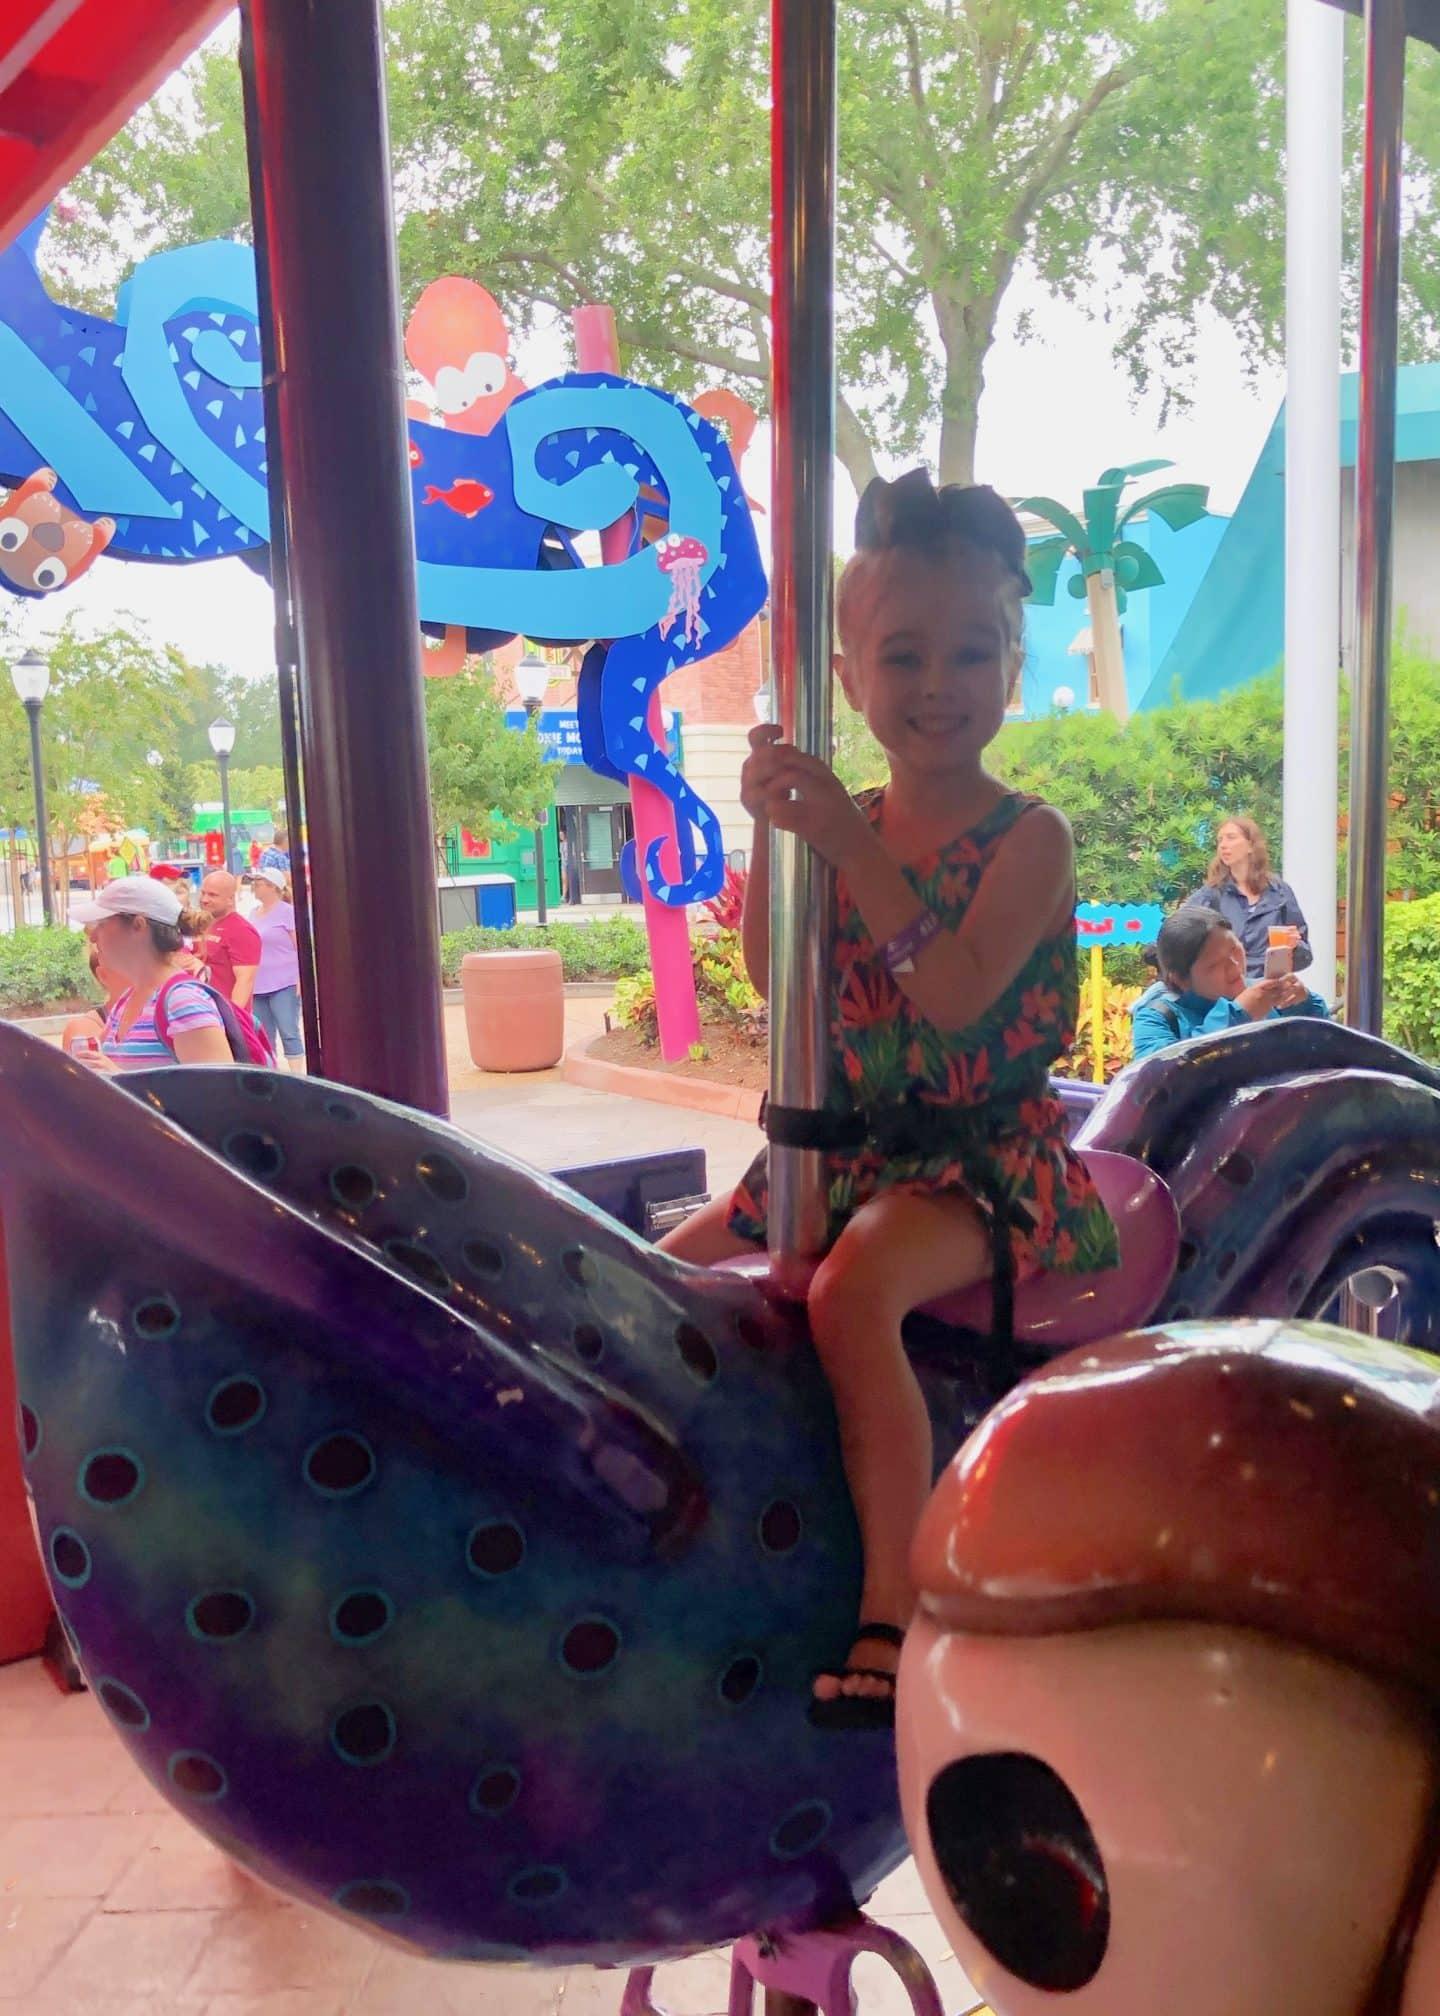 carousel at sea world